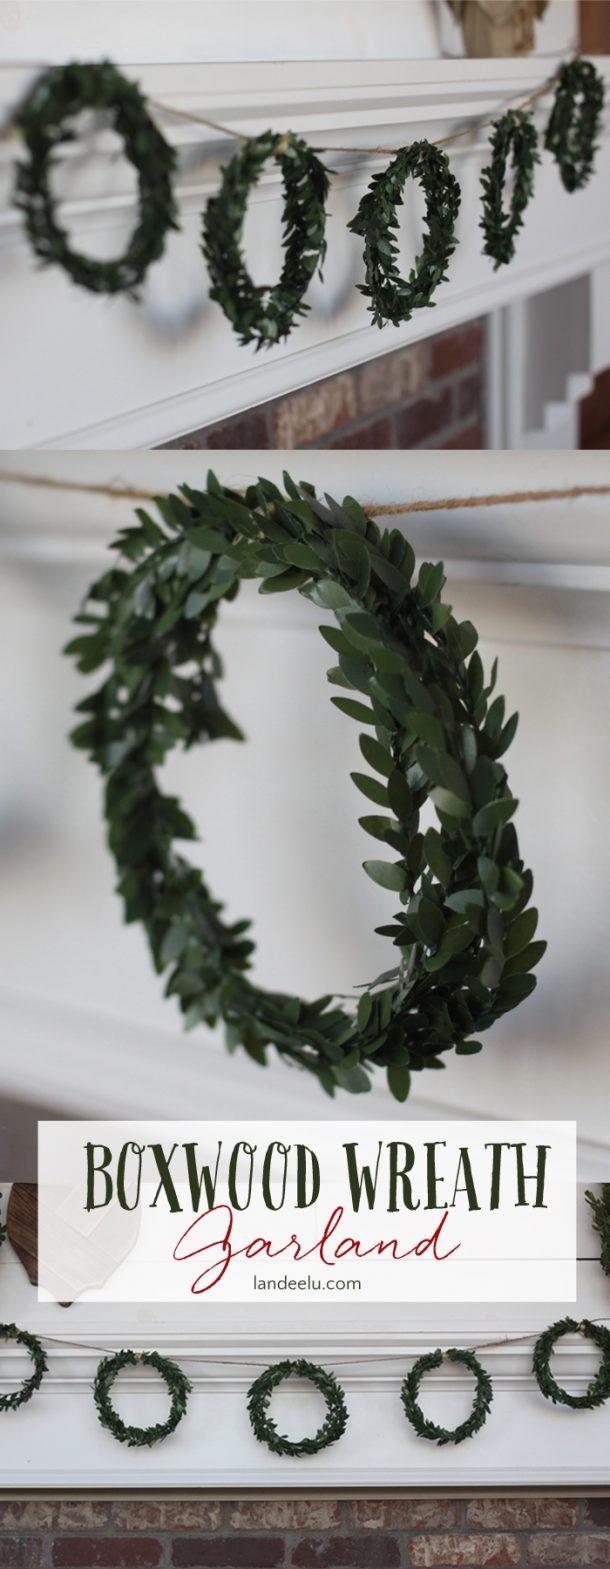 http://www.landeeseelandeedo.com/wp-content/uploads/2016/11/Boxwood-Wreath-Garland.jpg